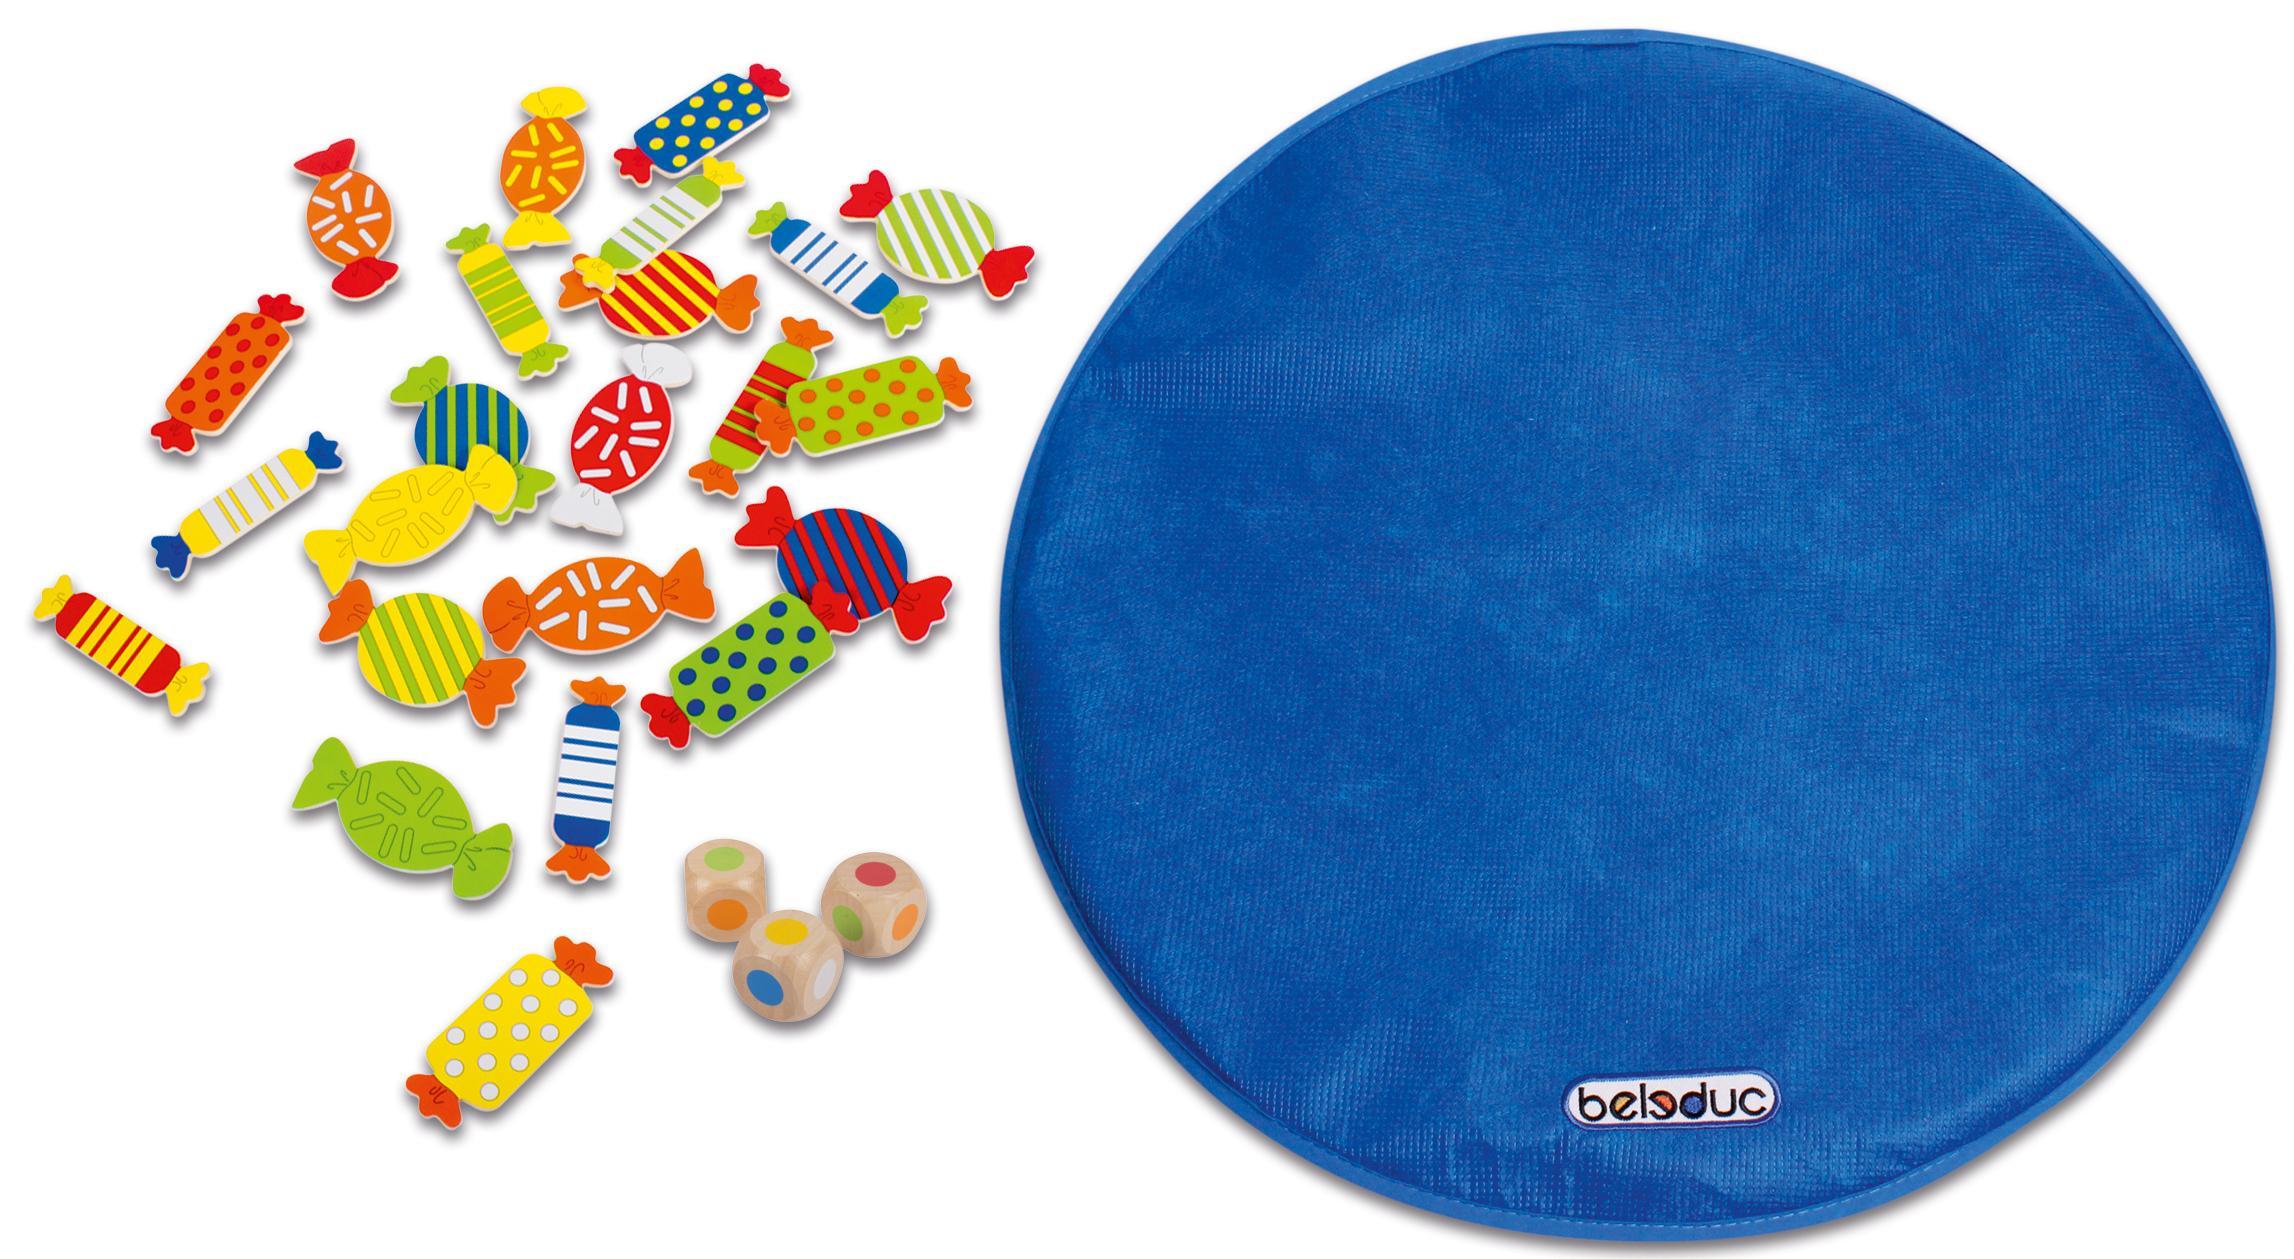 XXL Candy - Bodenspiel